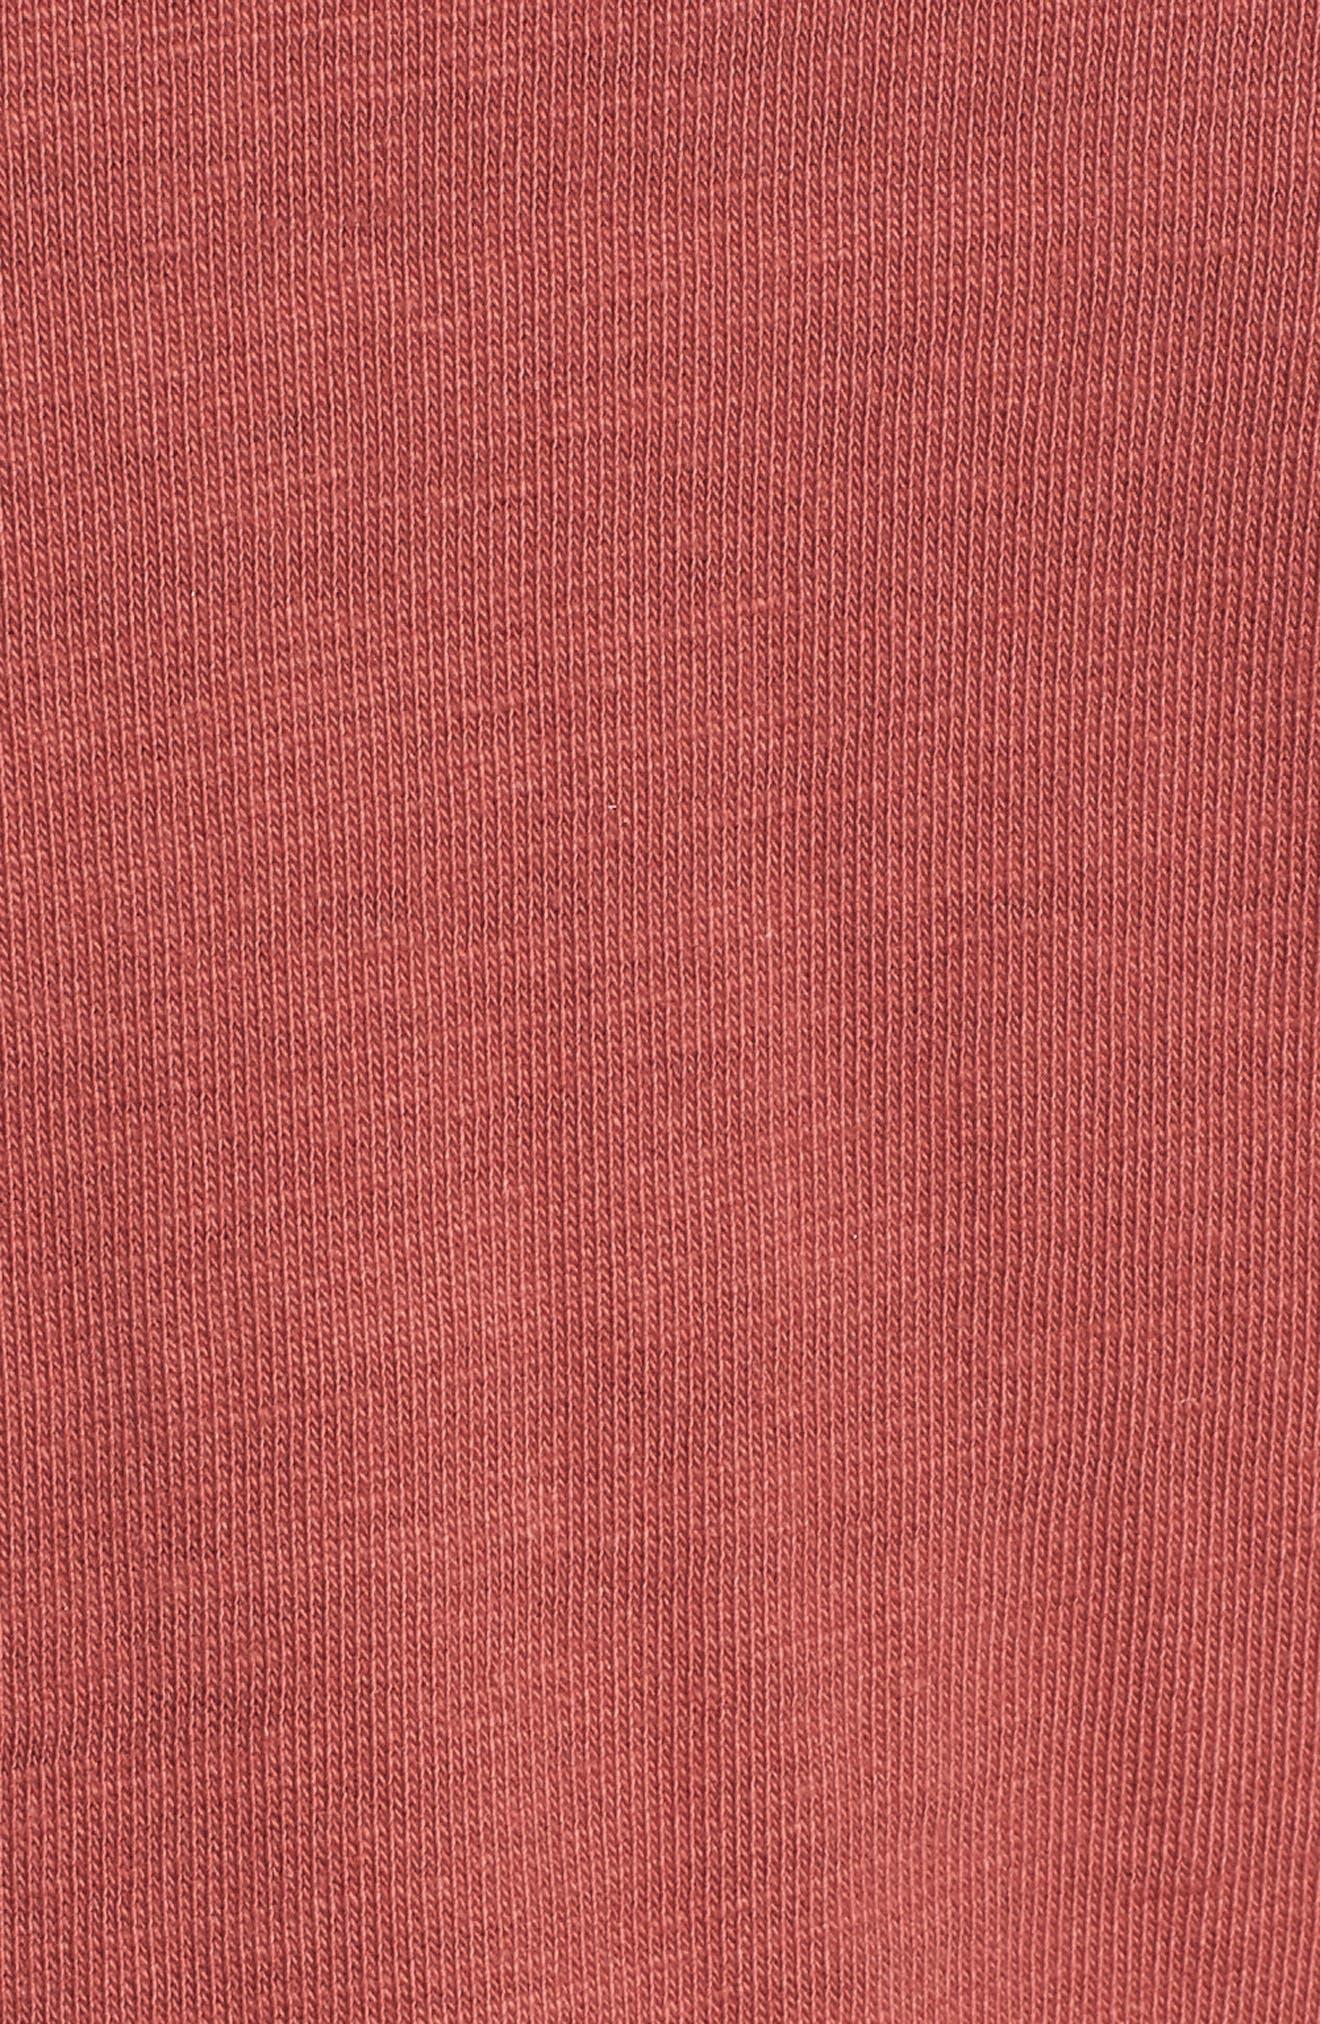 Knit One-Button Blazer,                             Alternate thumbnail 87, color,